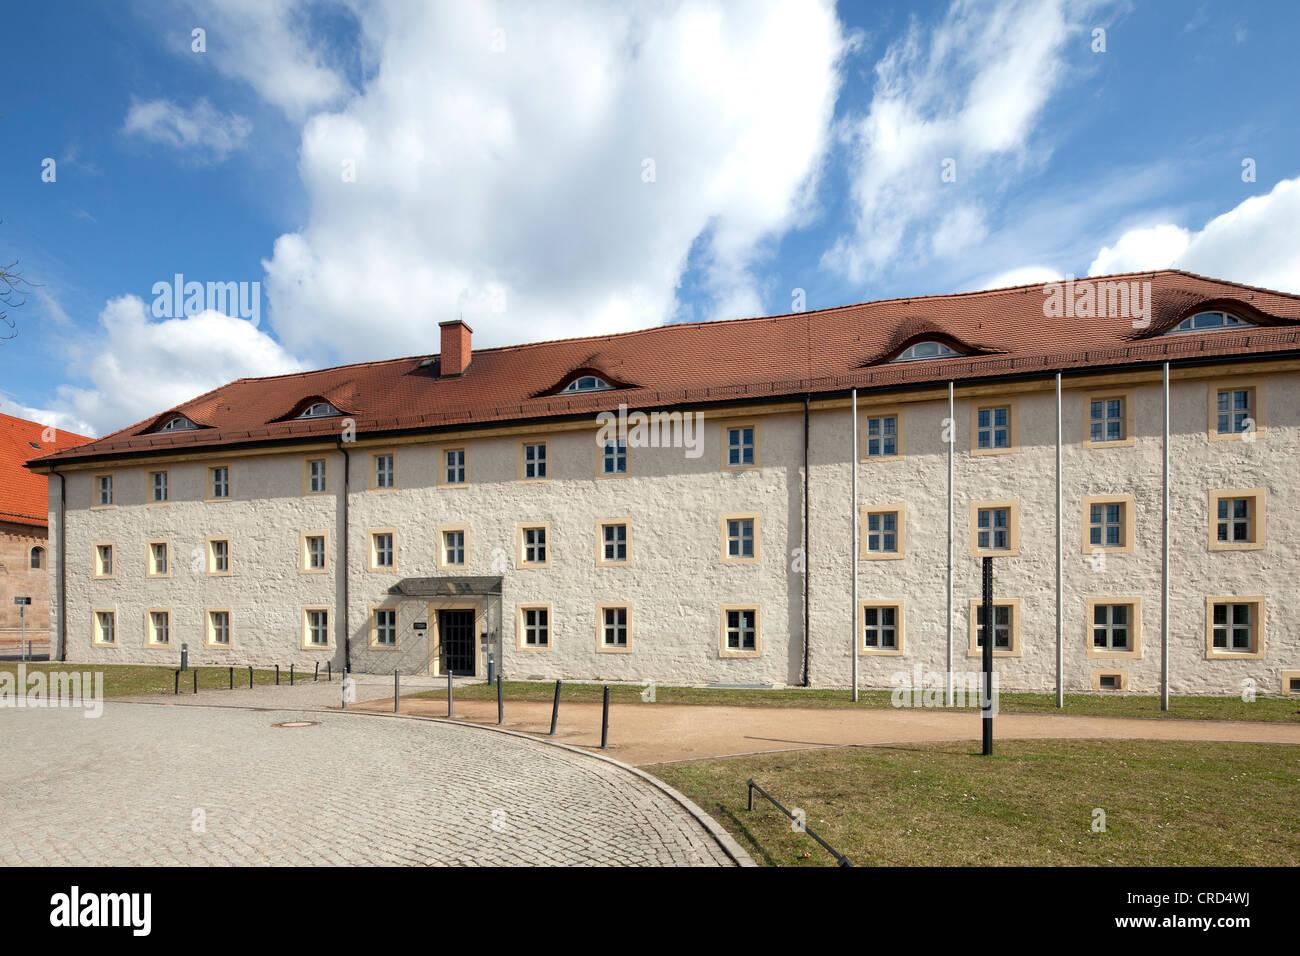 Zitadelle Petersberg citadel, Electorate of Mainz fortress, Baroque town fortress, Erfurt, Thuringia, PublicGround - Stock Image